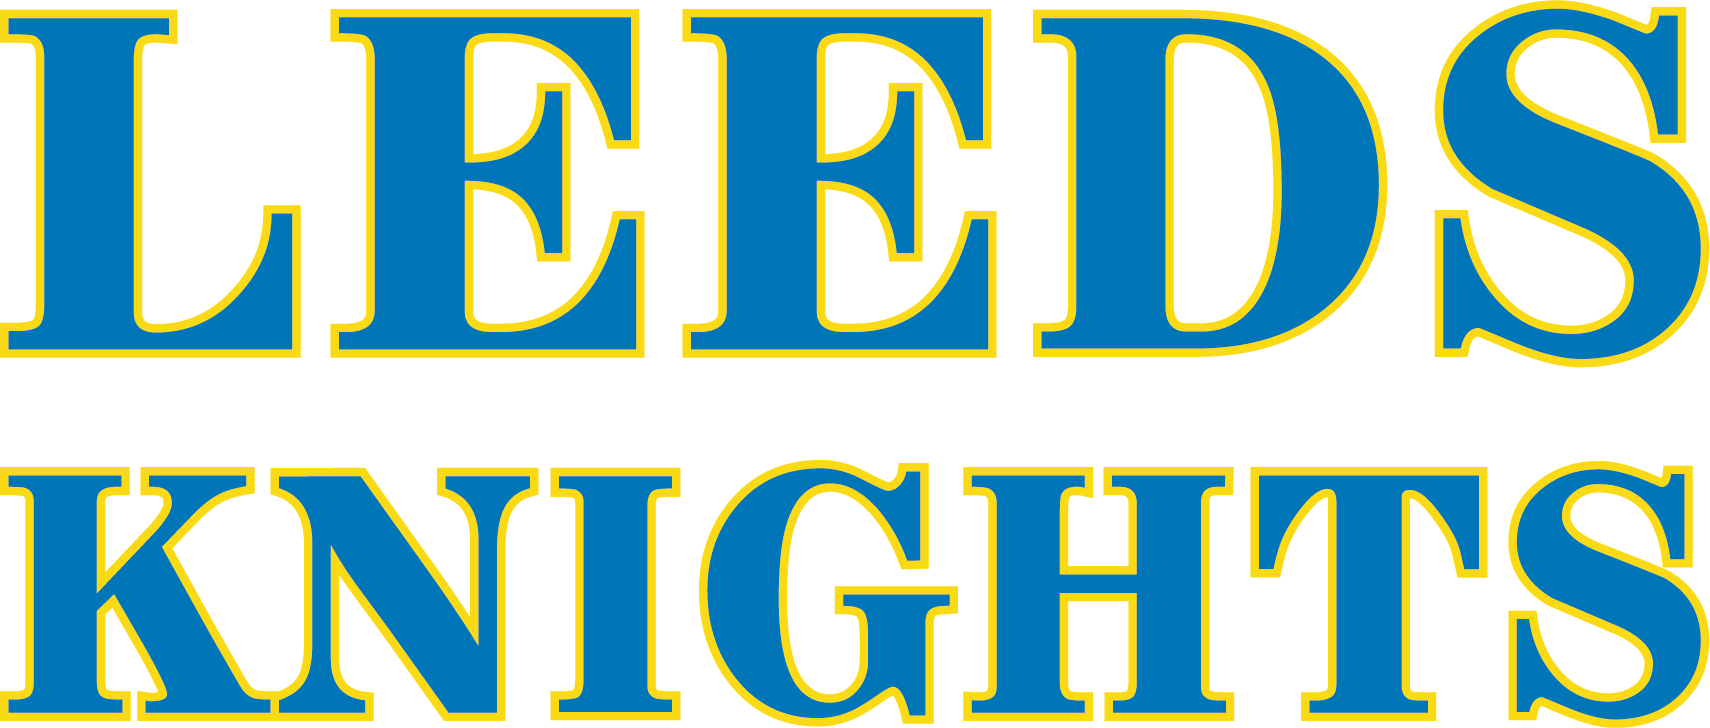 Leeds Knights text version landscape